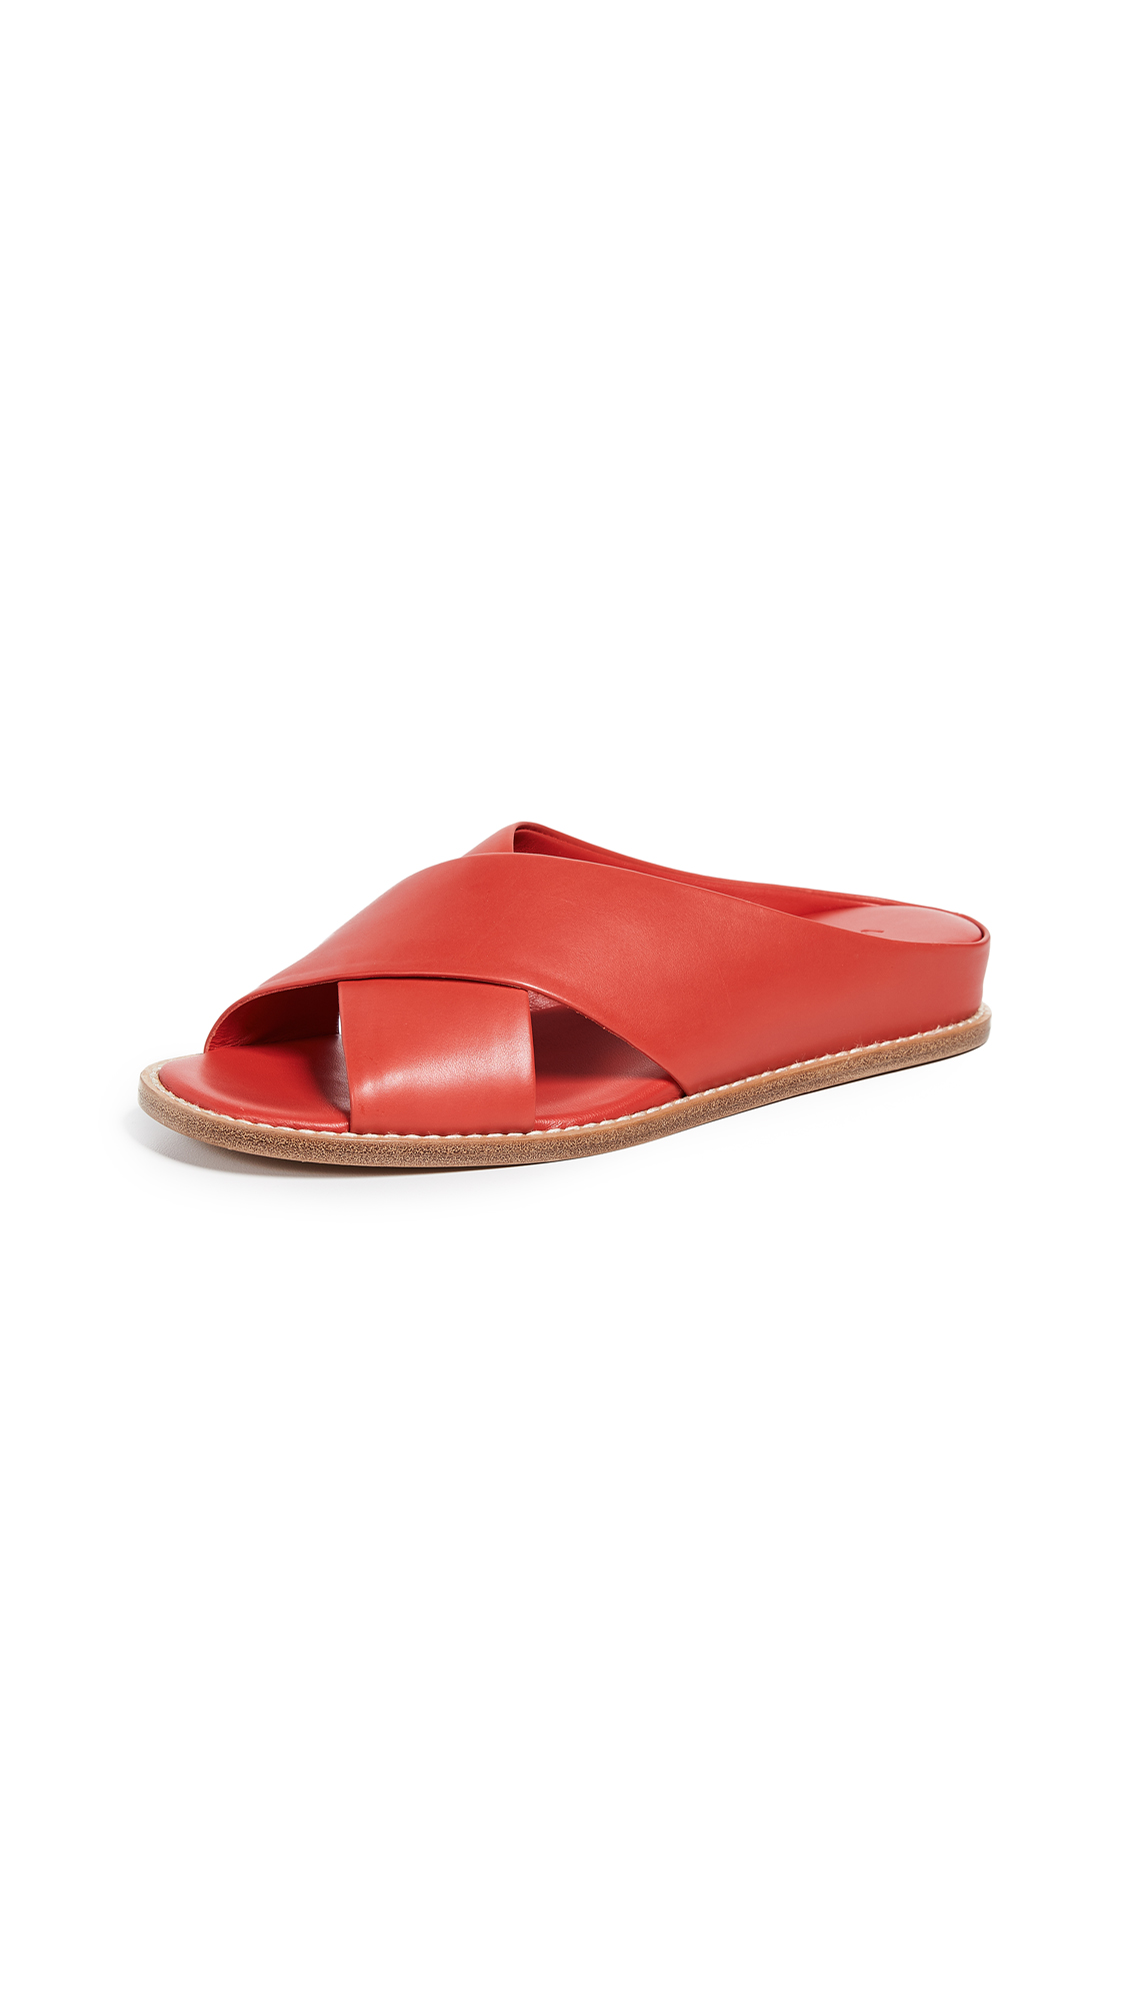 Vince Fairley Slide Sandals - Adobe Red